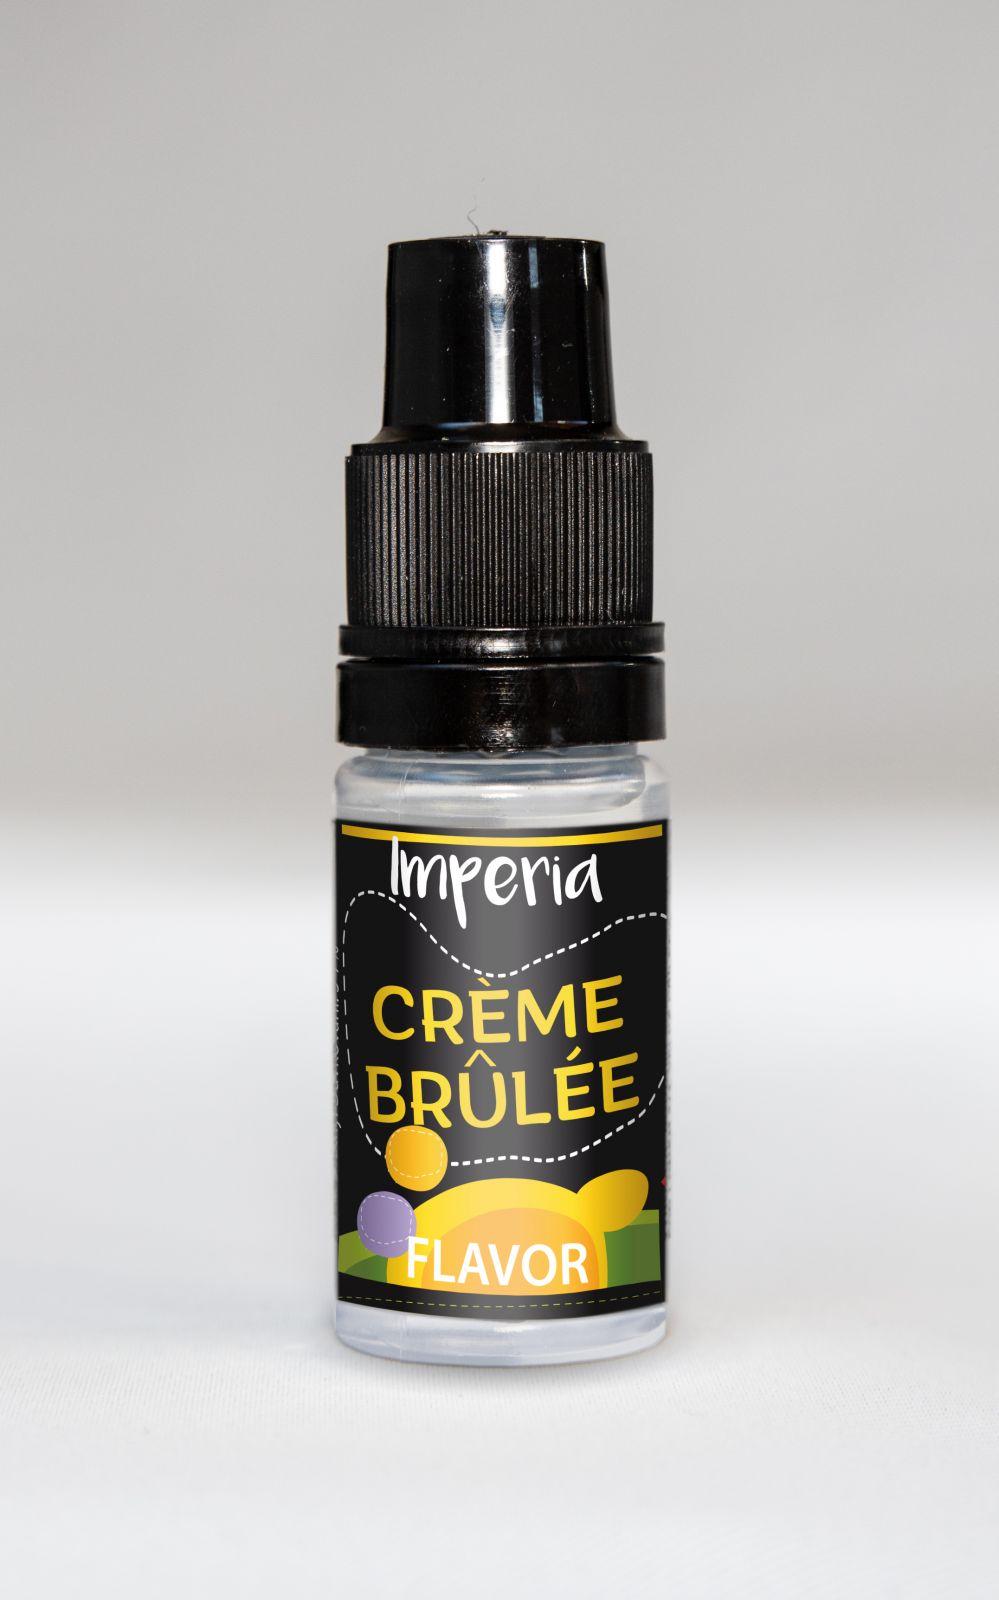 CREME BRULÉE - Aróma Imperia Black Label Boudoir Samadhi s.r.o.